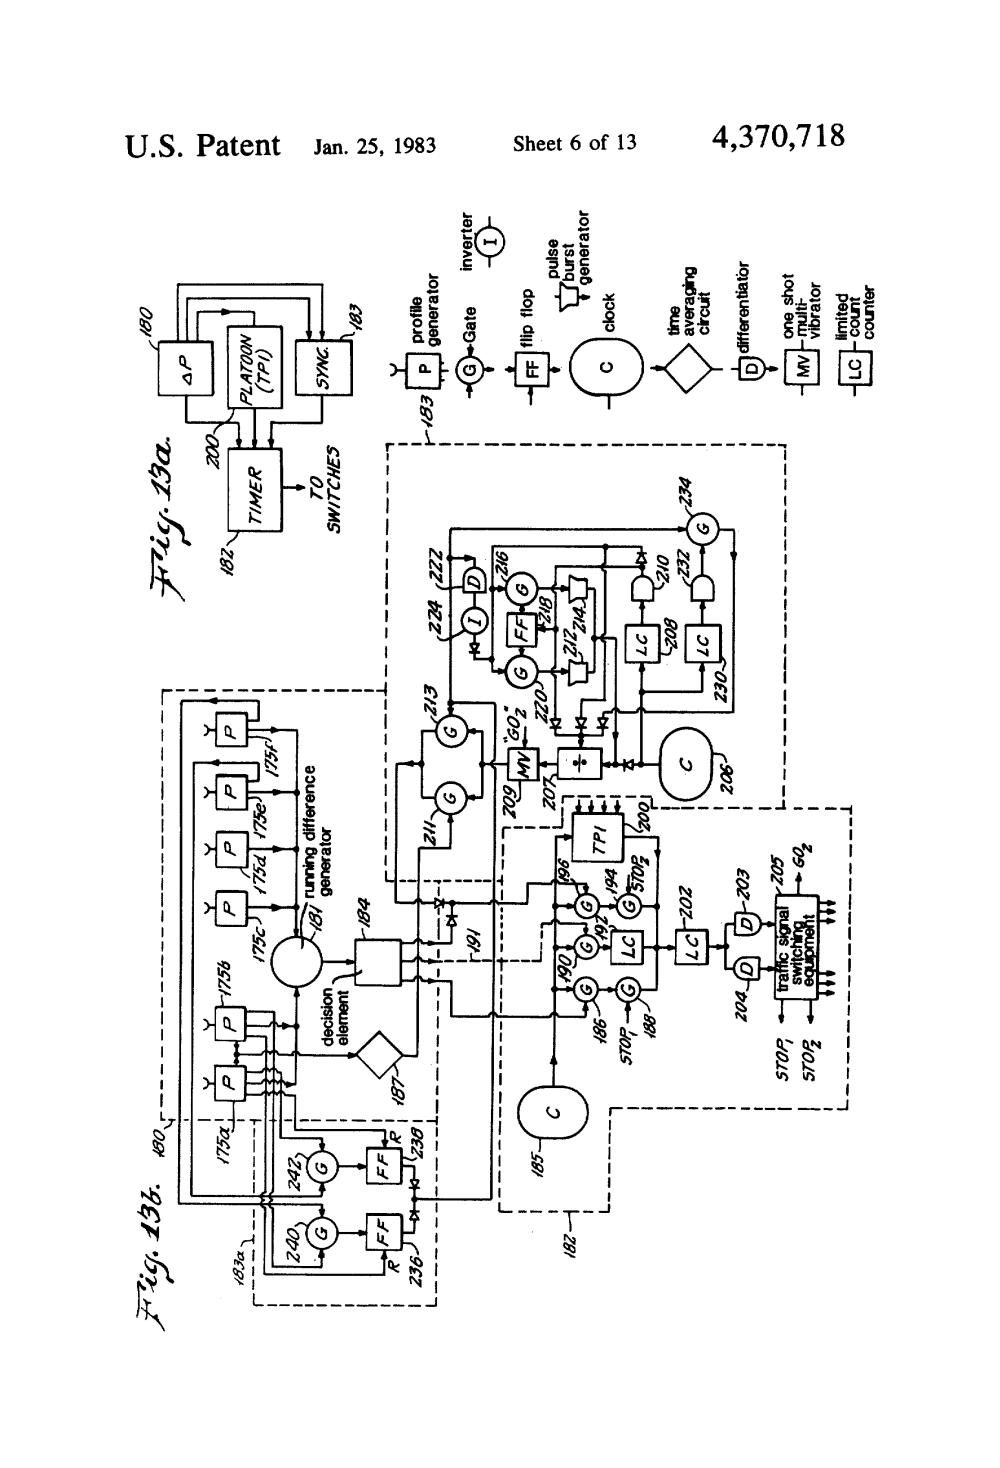 medium resolution of thor wiring diagram wiring diagramfecon wiring diagram 1 wiring diagram sourcefecon wiring diagram wiring diagramfecon wiring